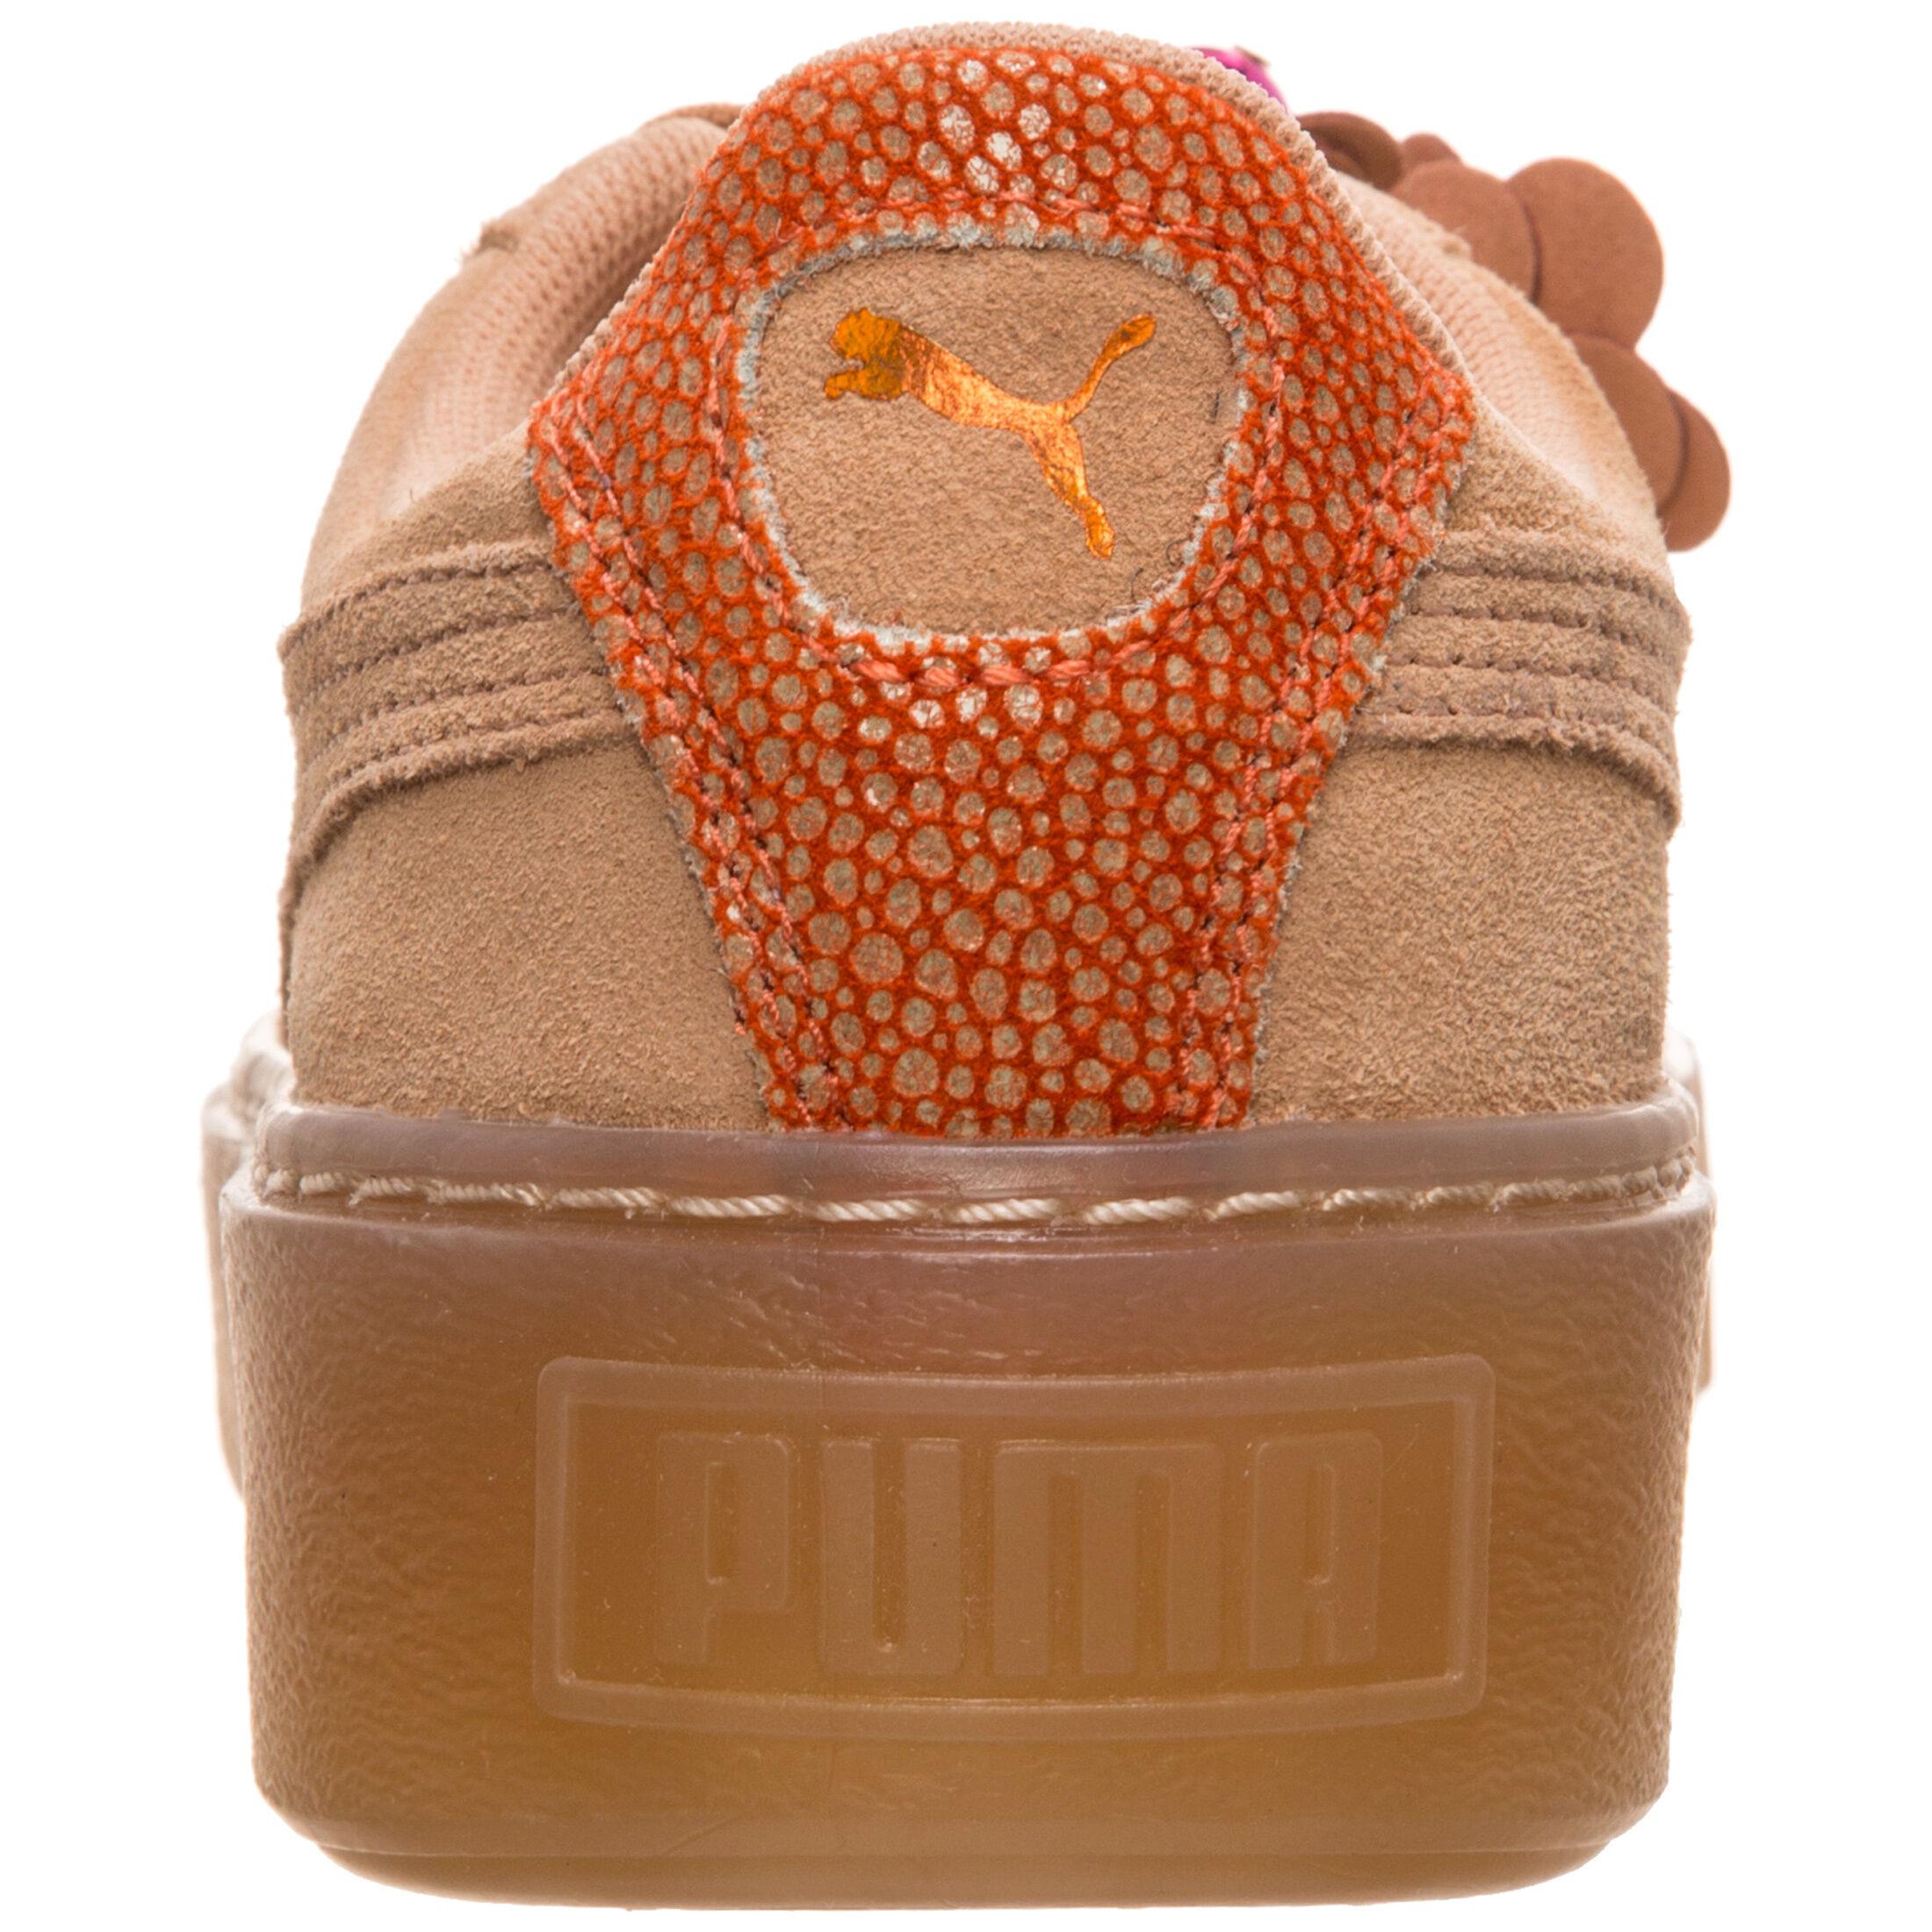 Puma Suede Platform Flower Tassel Sneaker Damen bei OUTFITTER